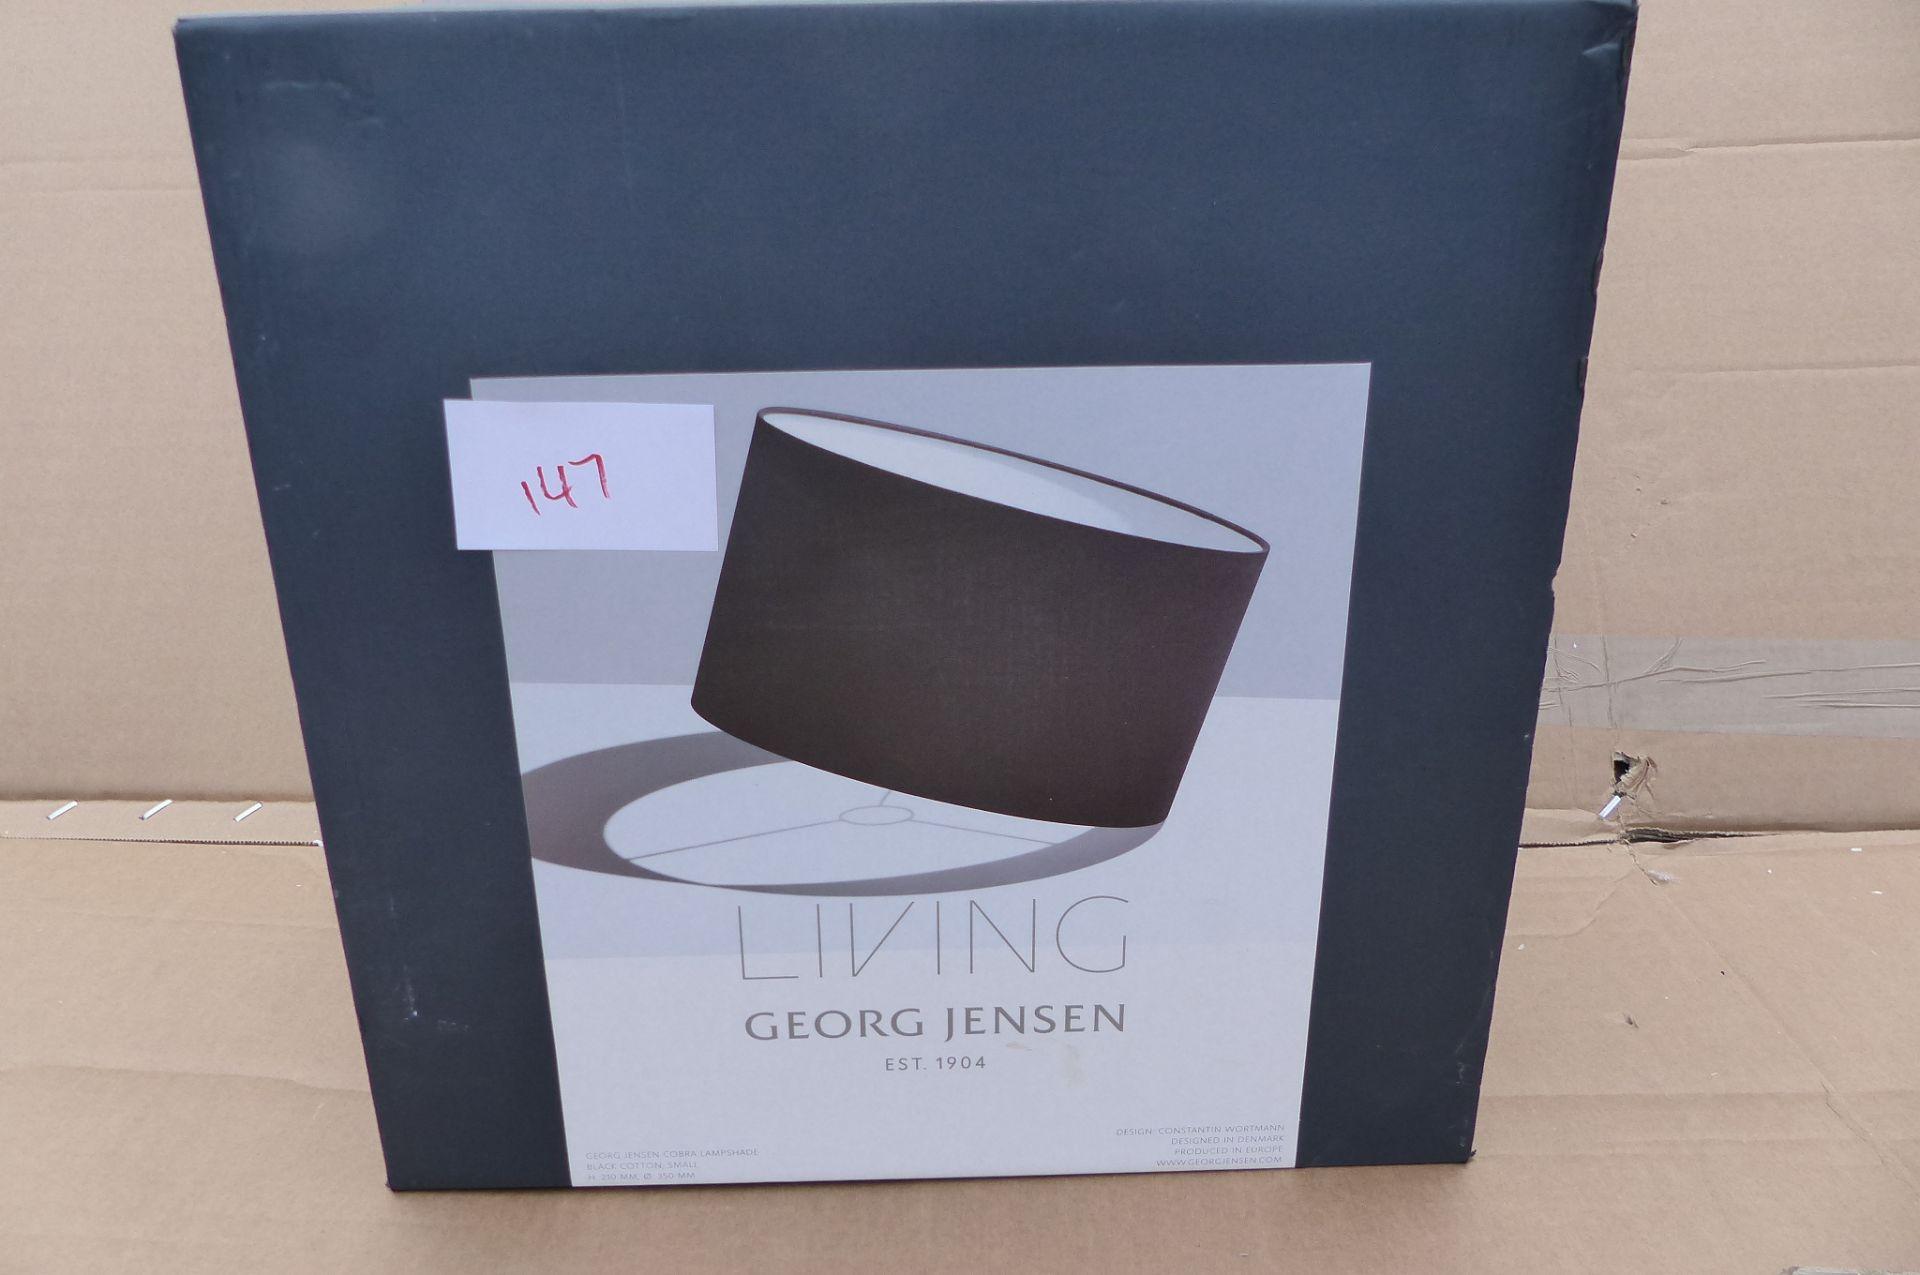 Georg Jensen Lamp shade